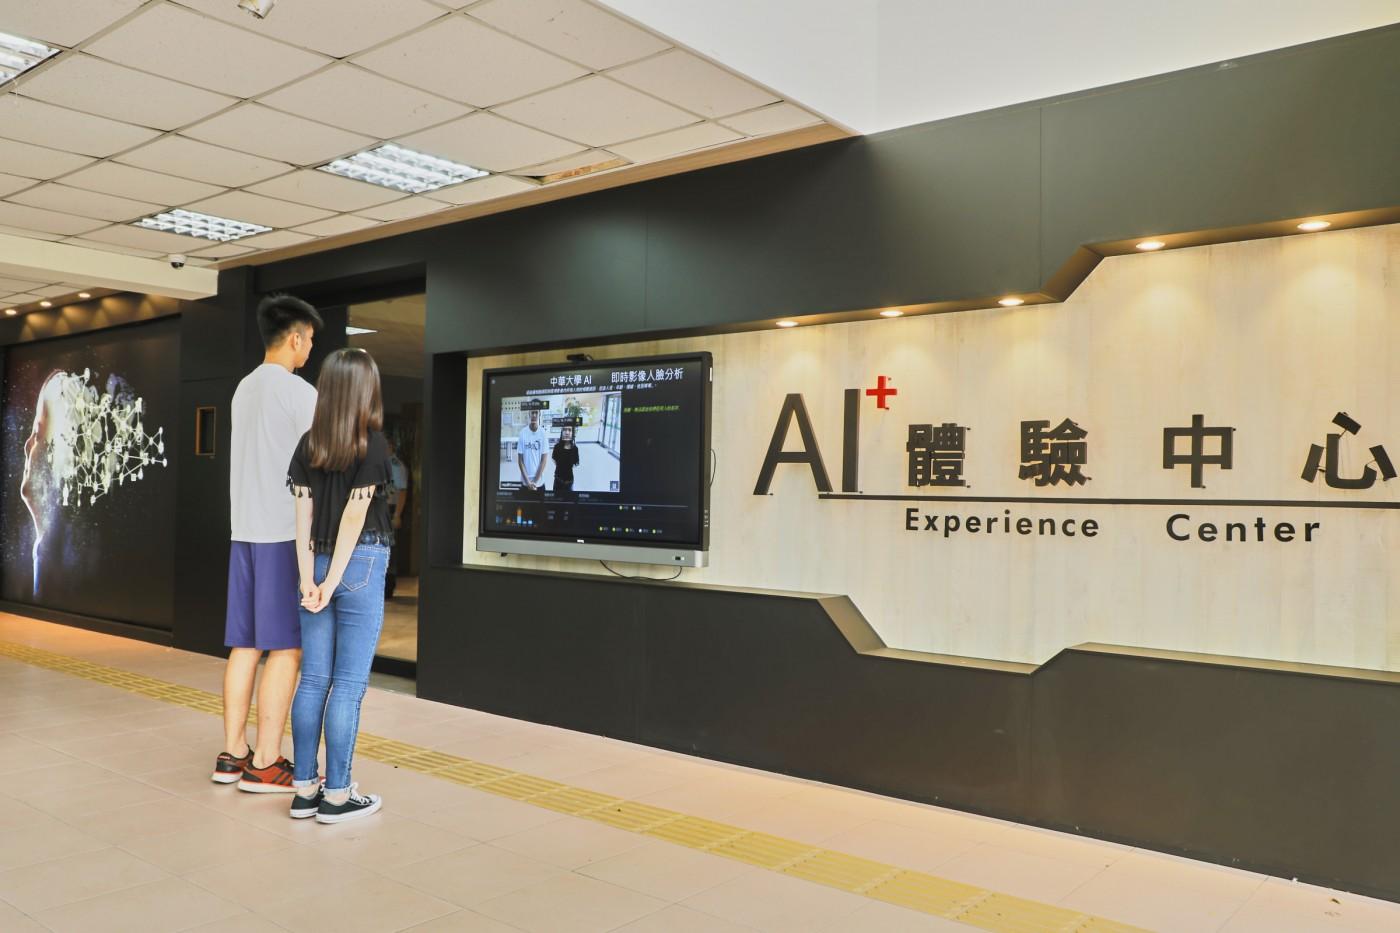 AI課程走入教育第一線,微軟攜手中華大學設立人工智慧體驗中心